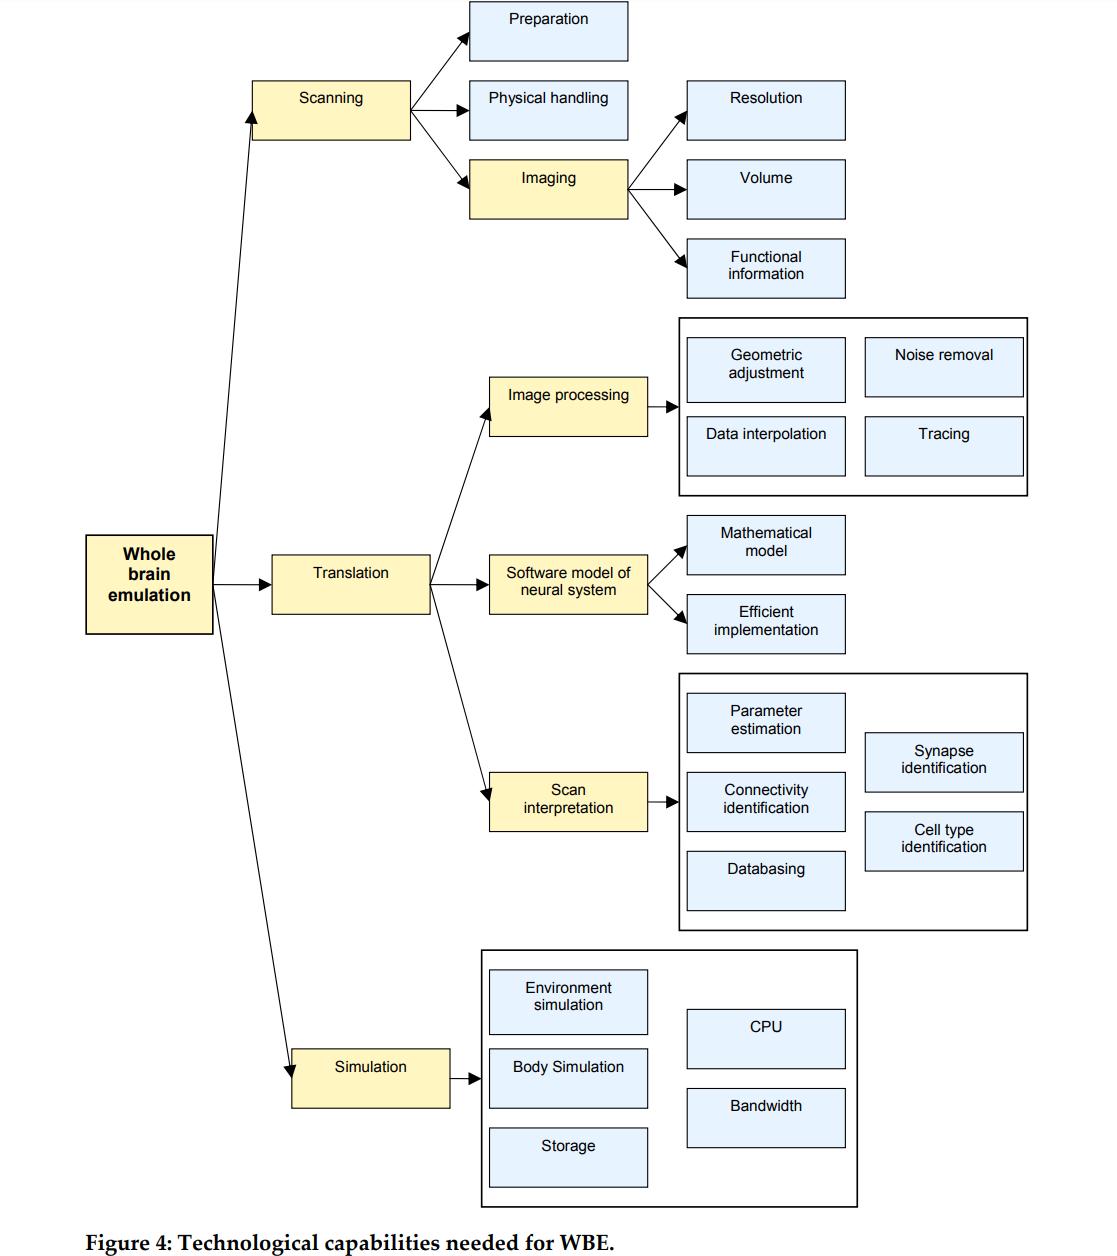 Tech tree from Sandberg & Bostrom, 2008